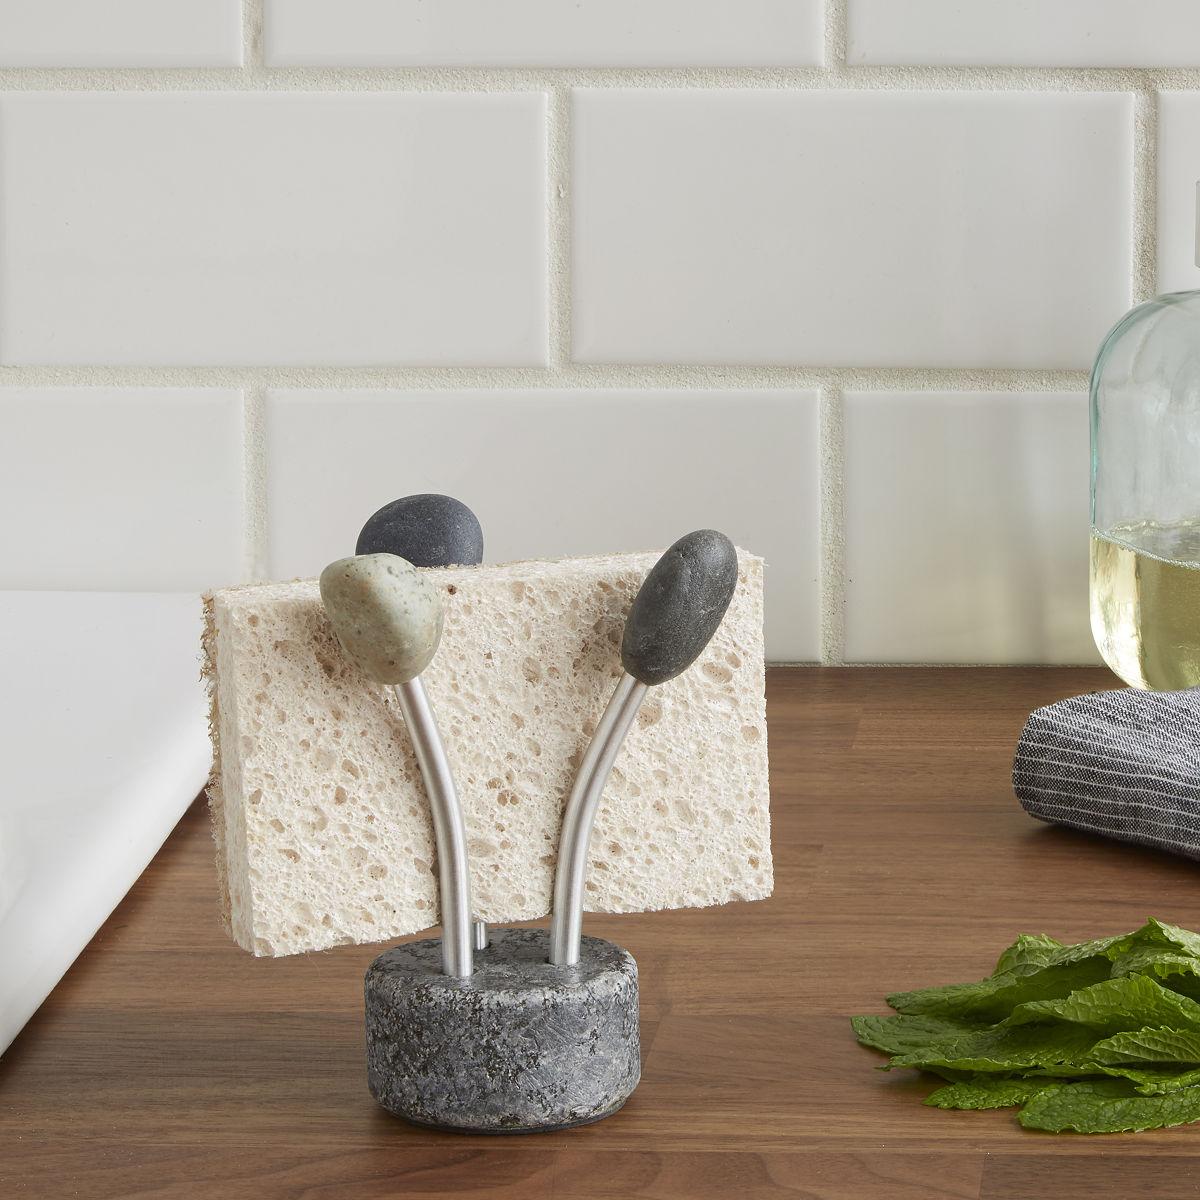 Ine design stone 187 other products - Sea Stone Splash Sponge Holder 3 Thumbnail